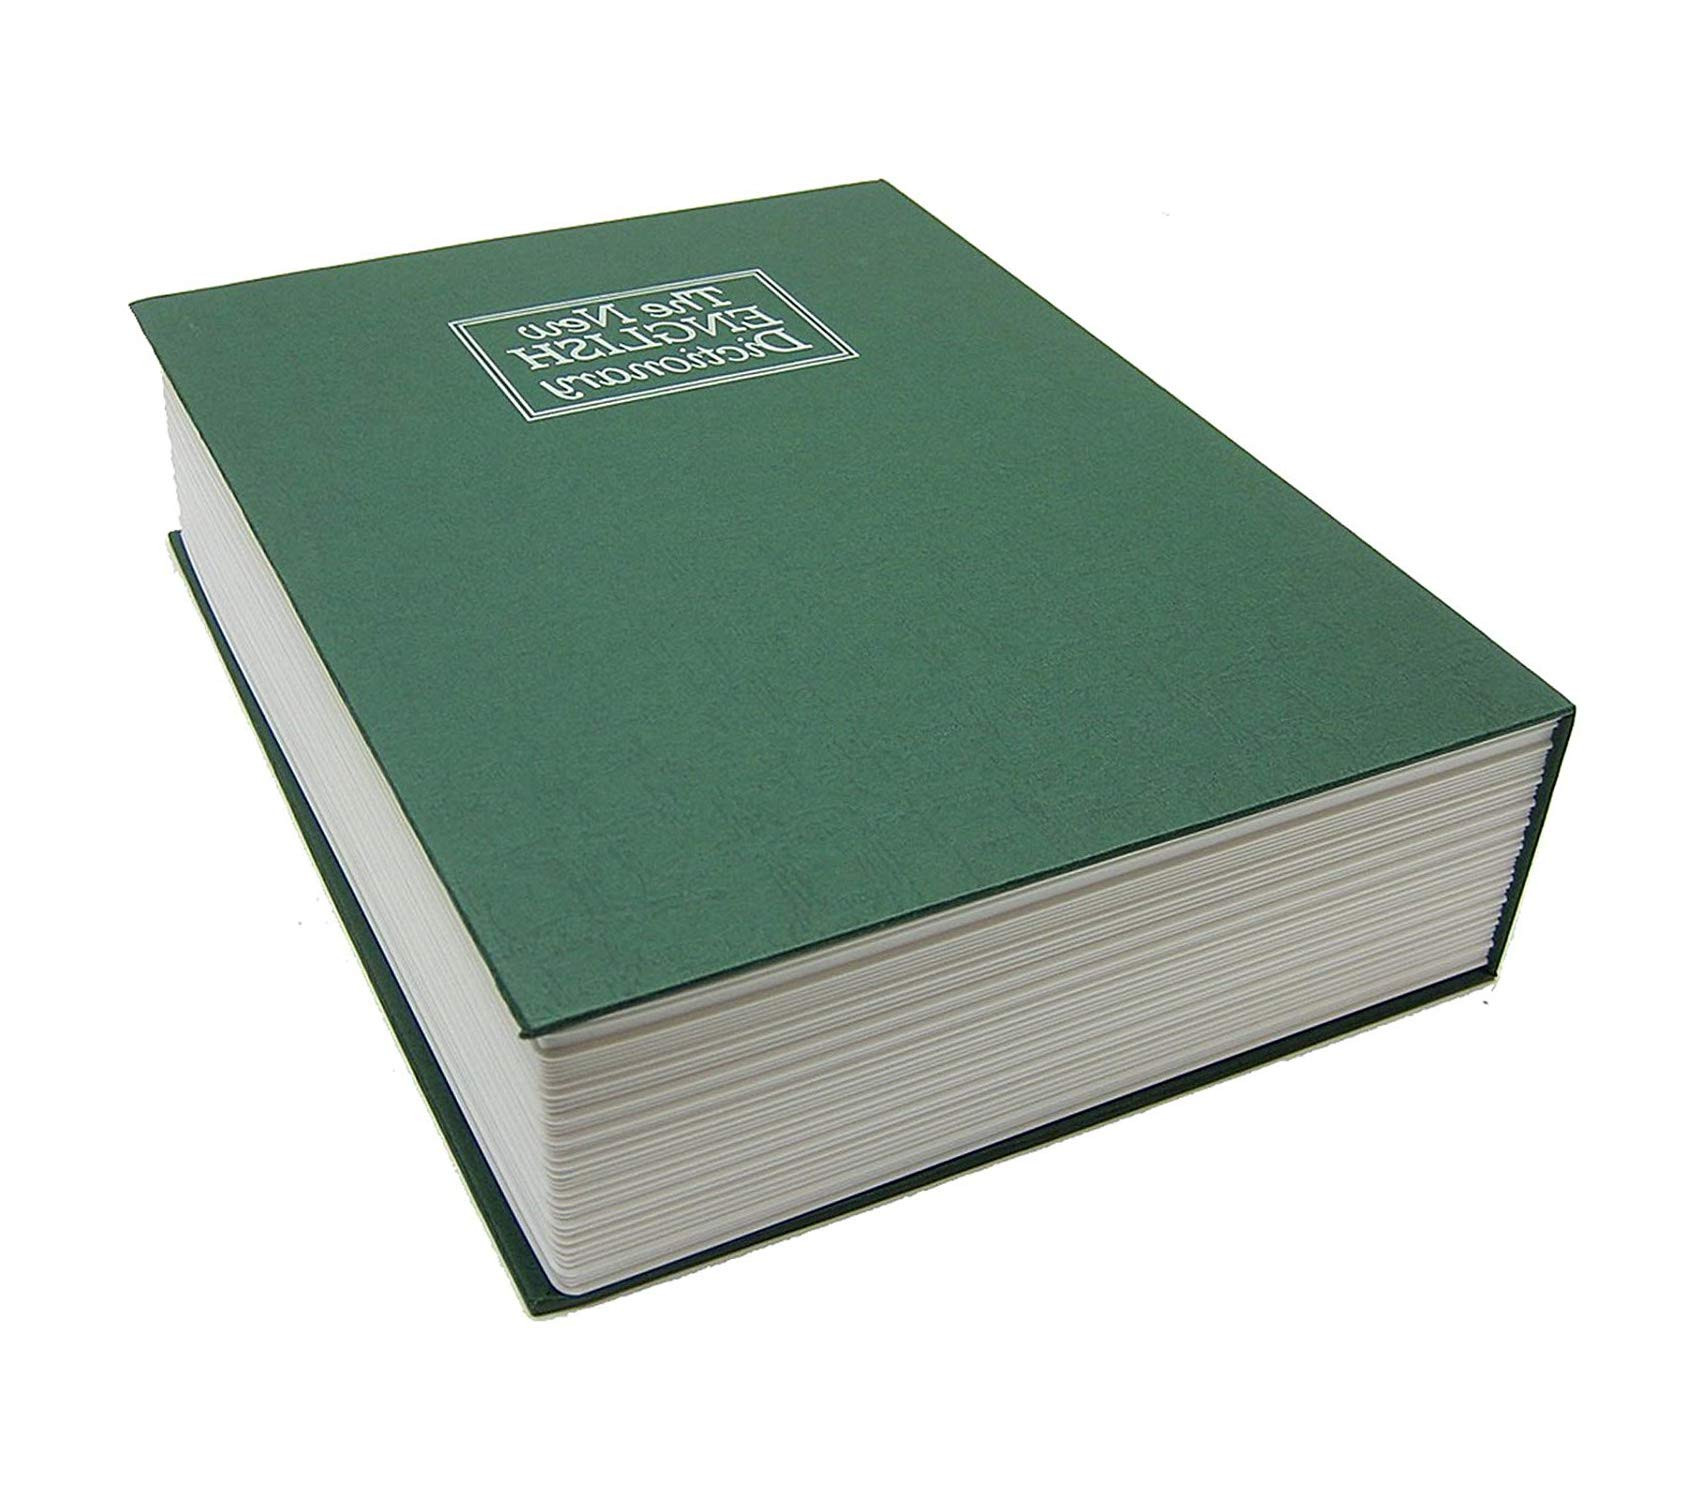 Bluеdоt Trаding Office Home Furniture Premium Secret Book Hidden Safe with Key Lock, Small, Green